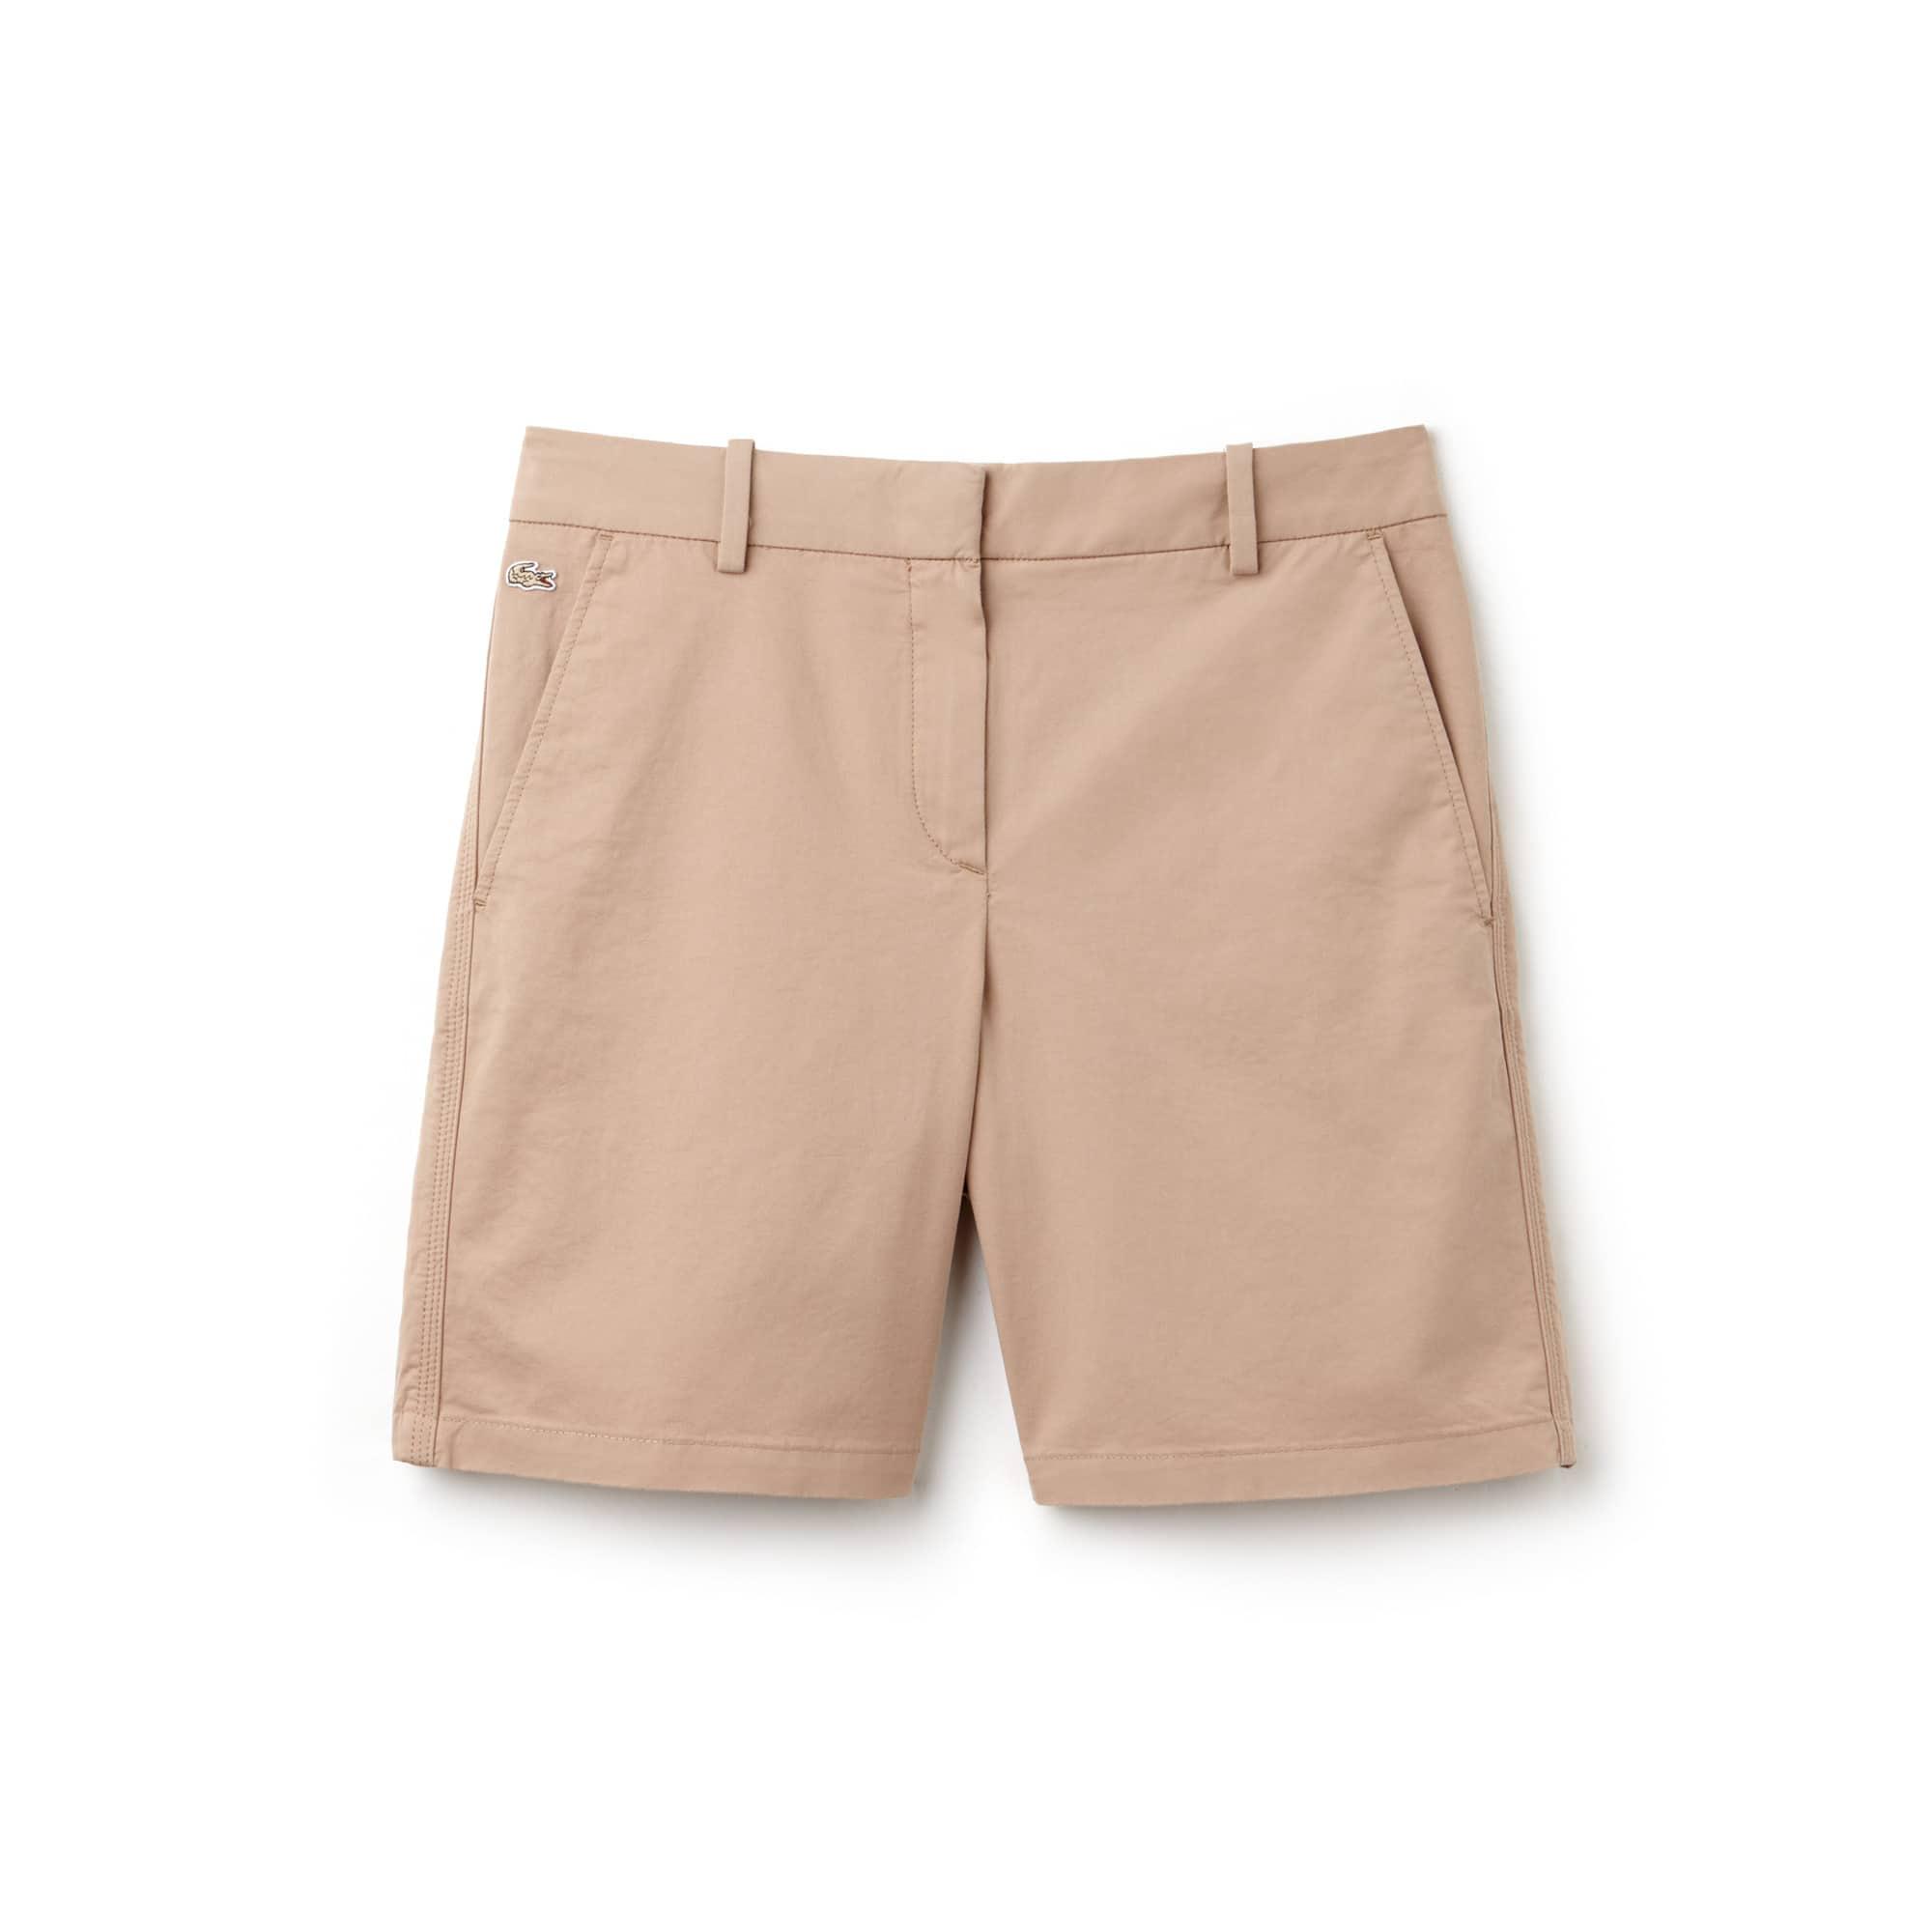 Women's Chino Cut Stretch Gabardine Bermuda Shorts